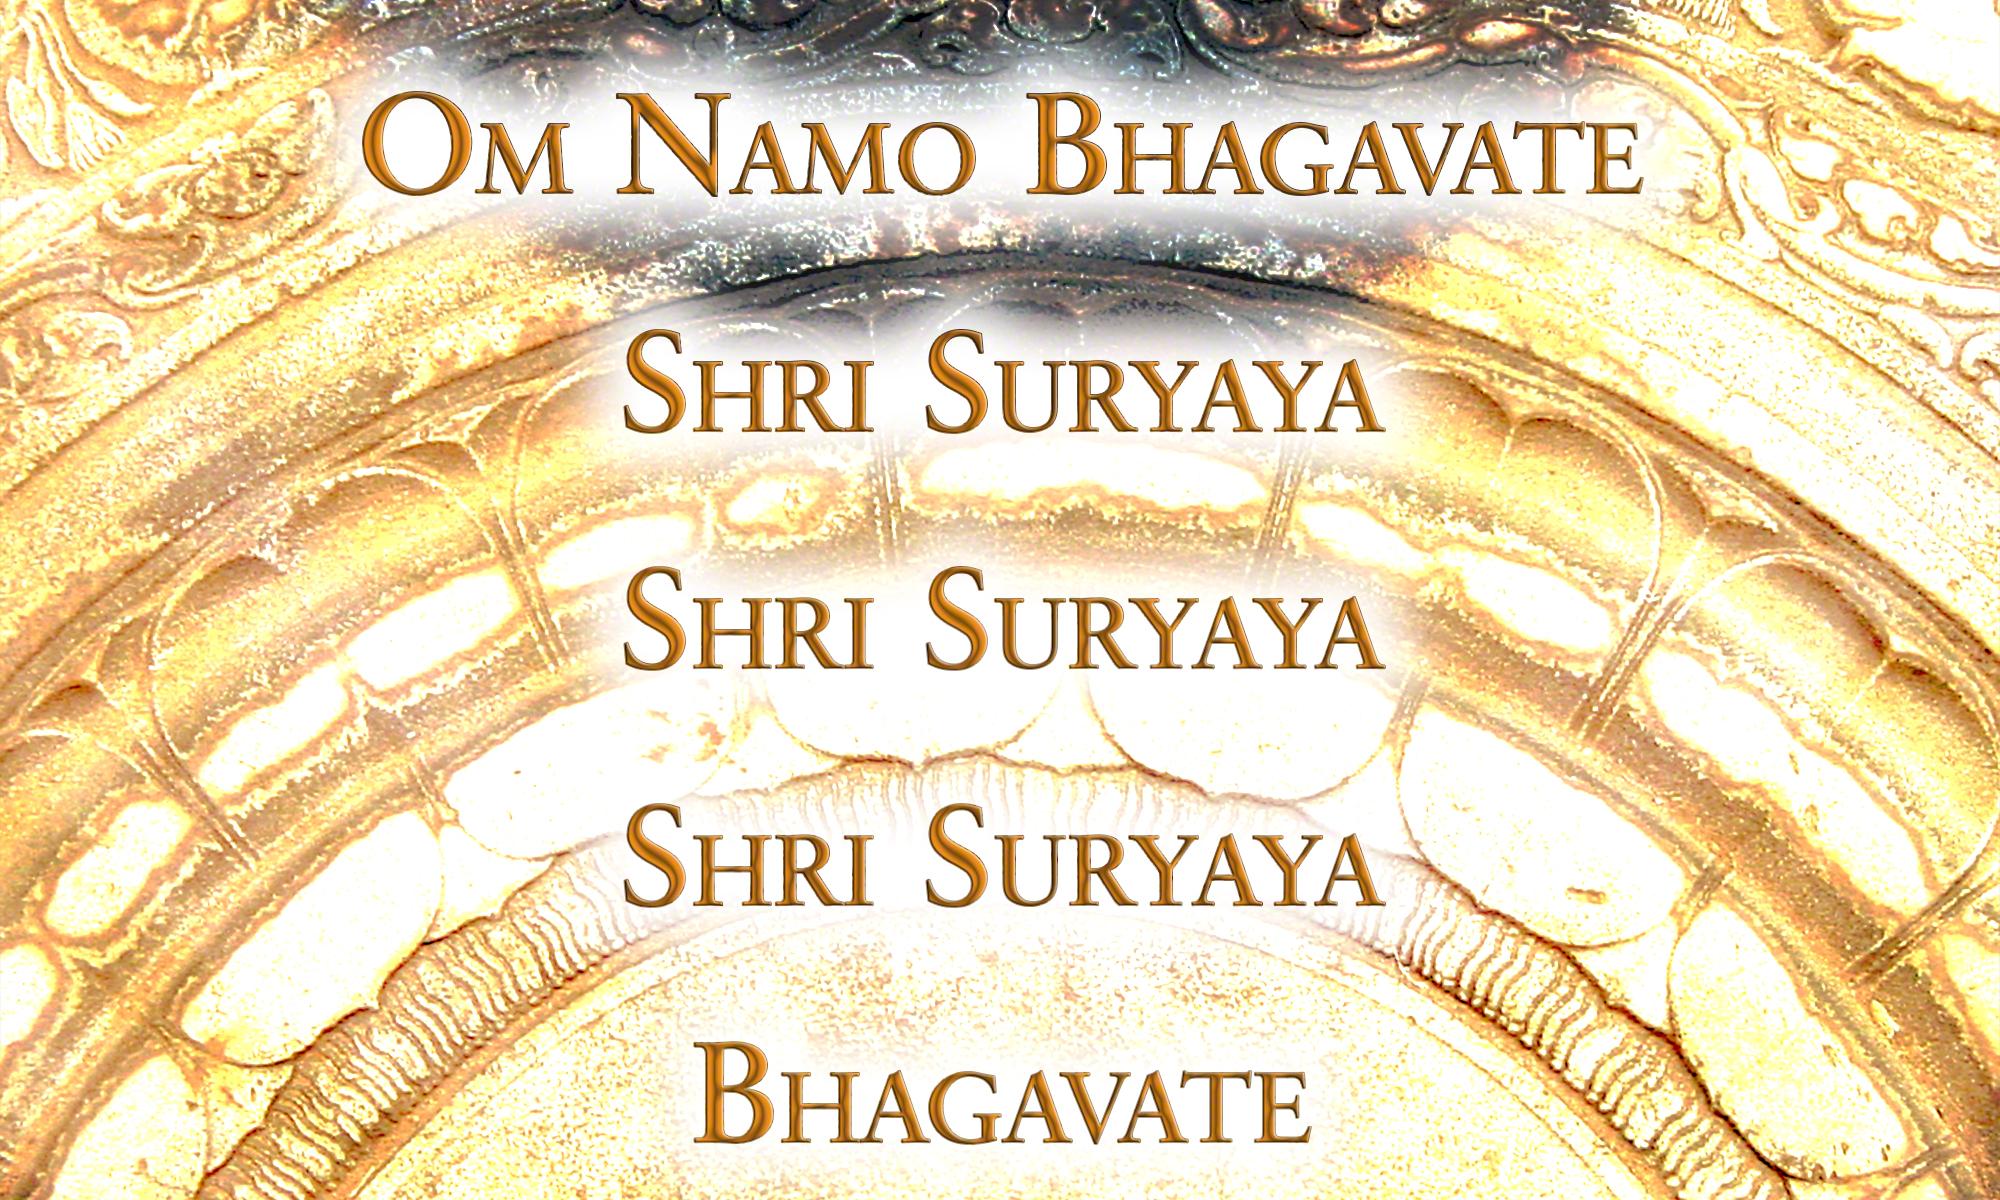 Om Namo Bhagavate Surya Mantra Lyrics